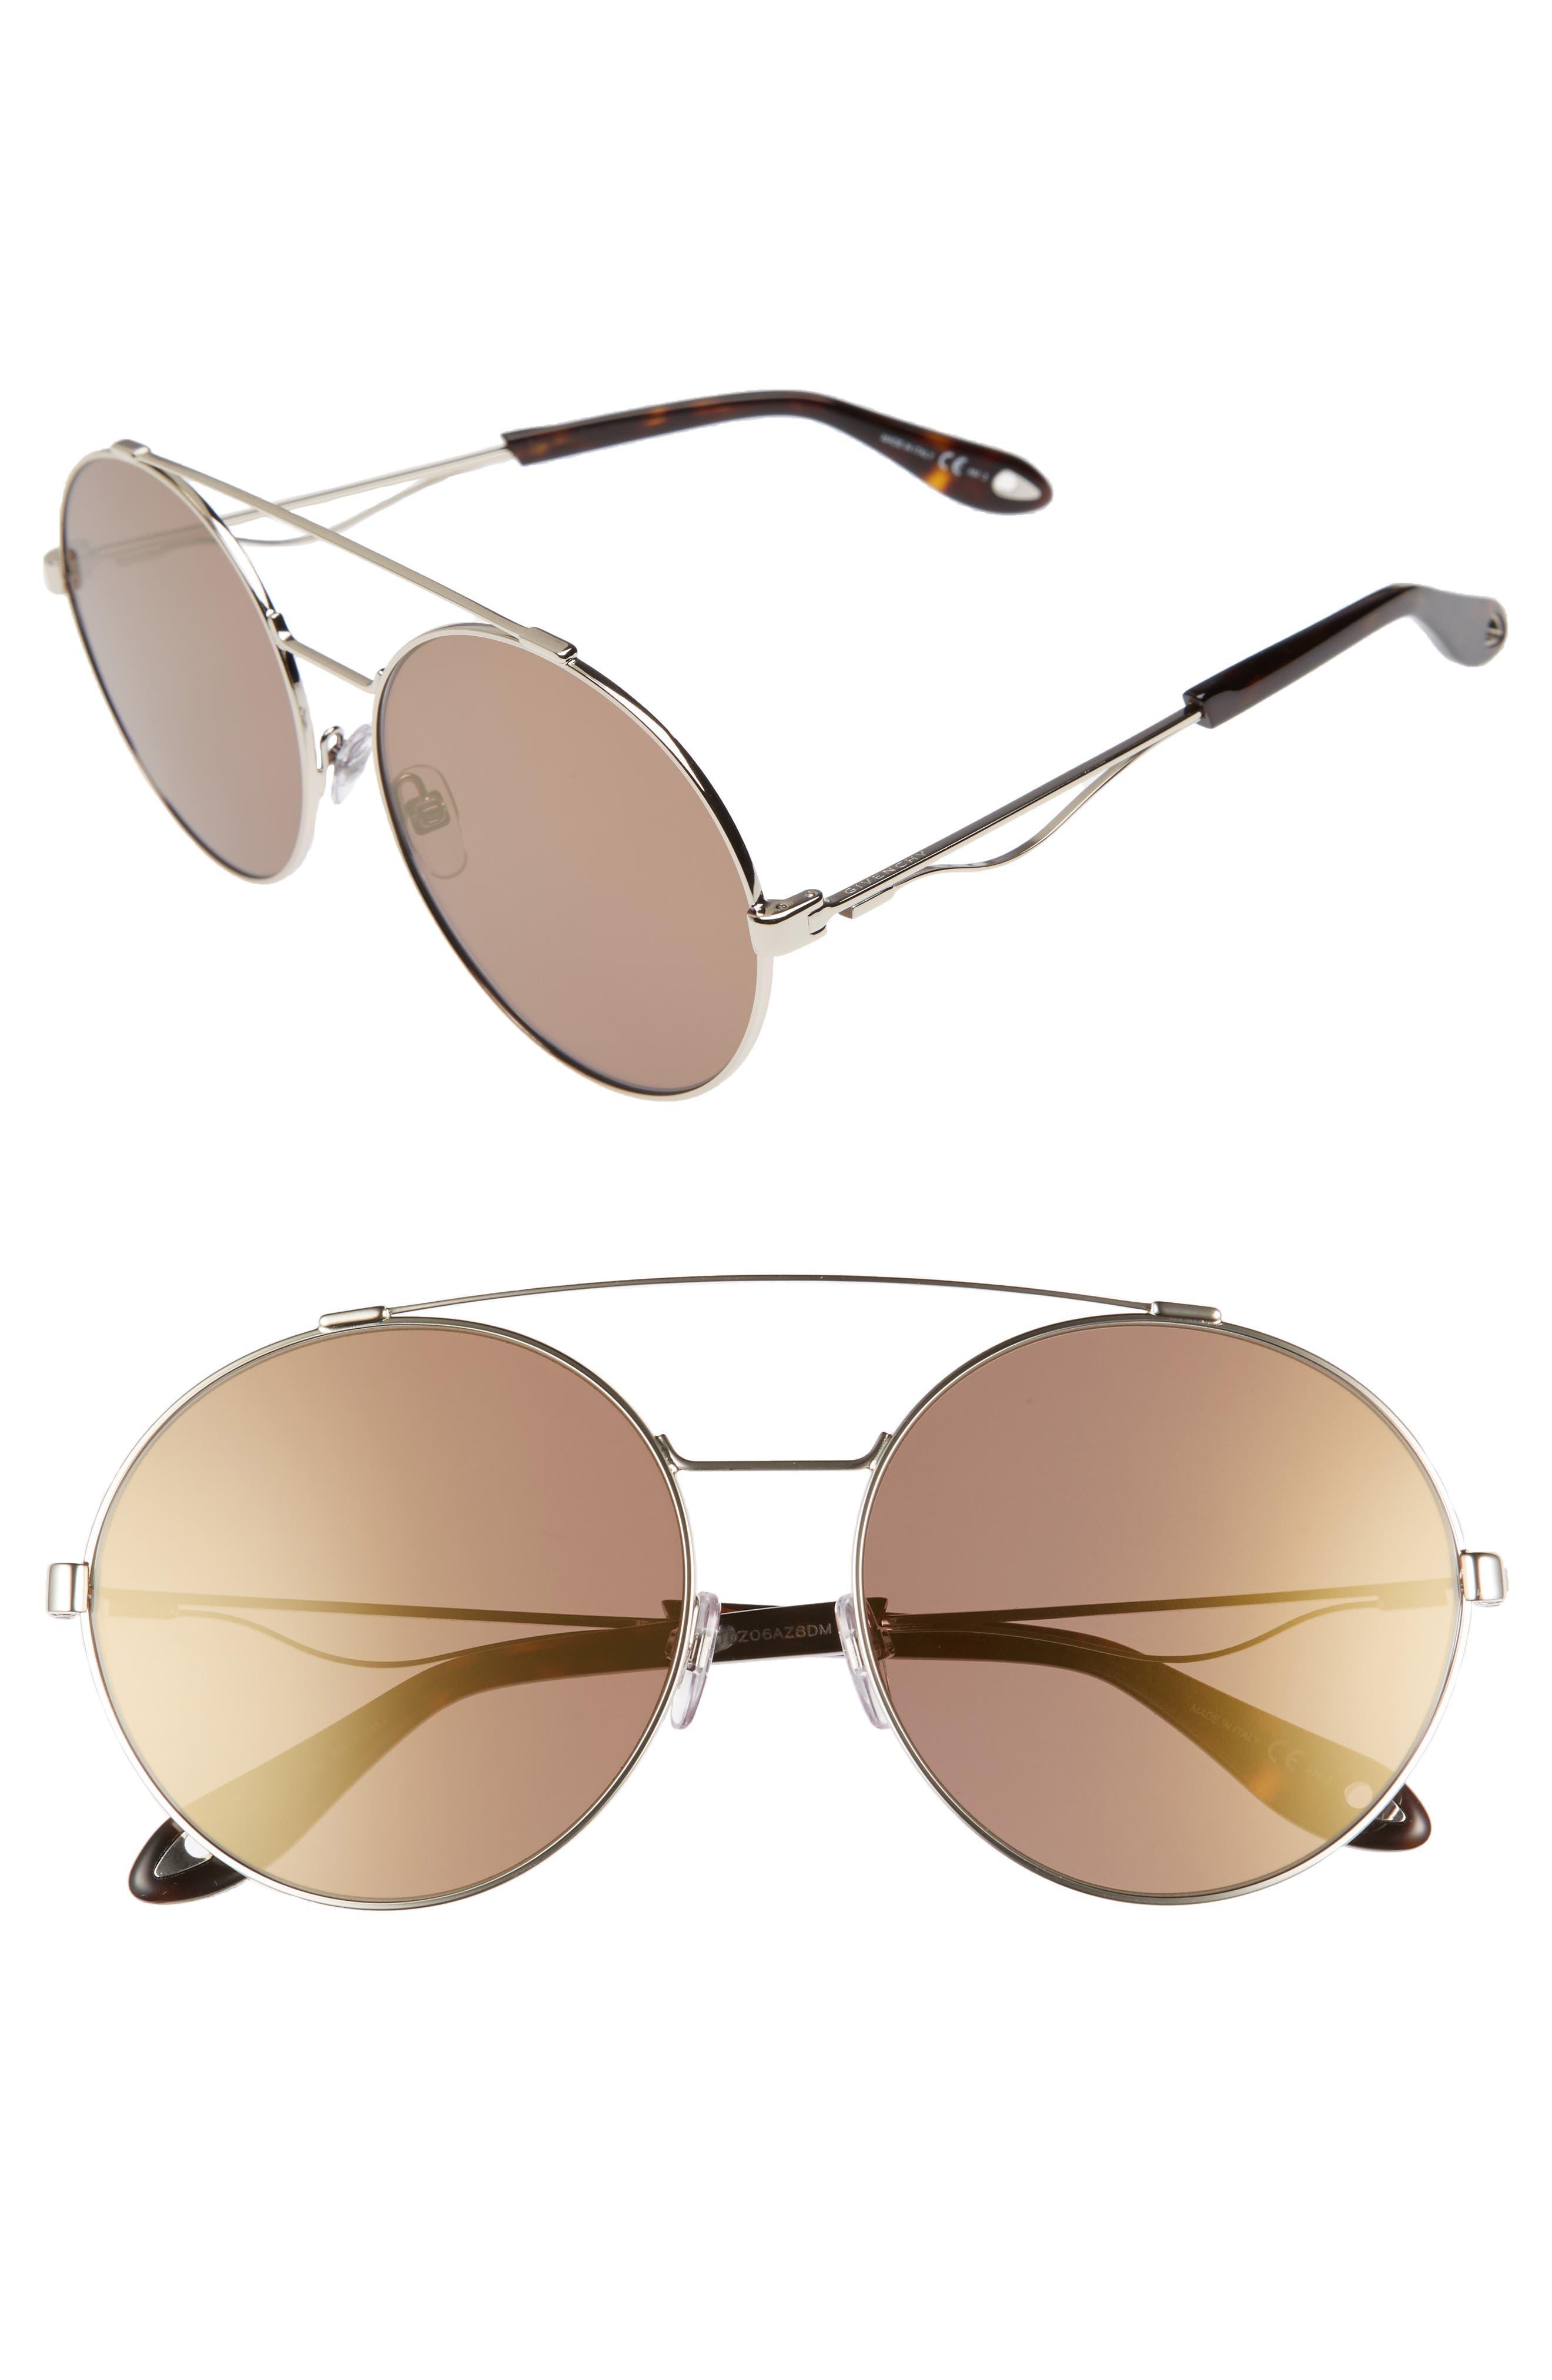 62mm Oversize Round Sunglasses,                         Main,                         color, LIGHT GOLD